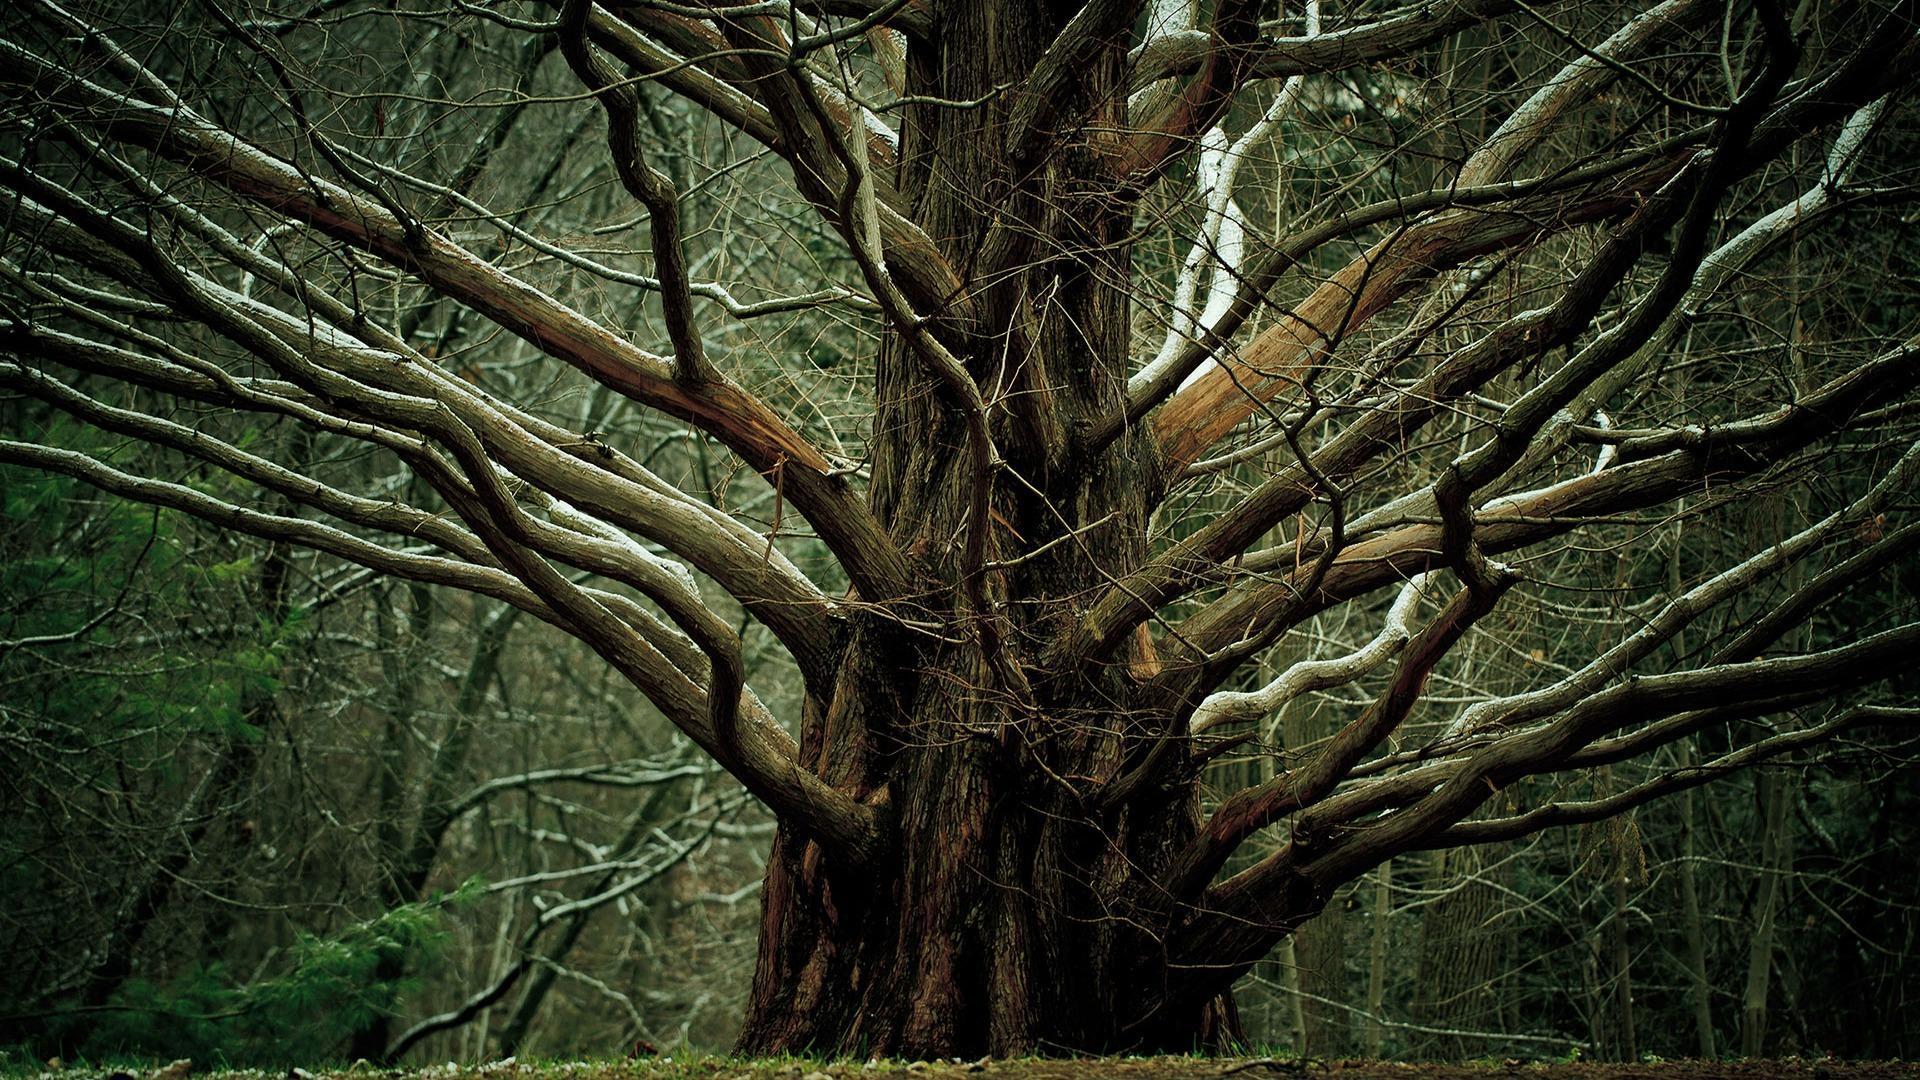 8k Giant Tree Wallpapers Top Free 8k Giant Tree